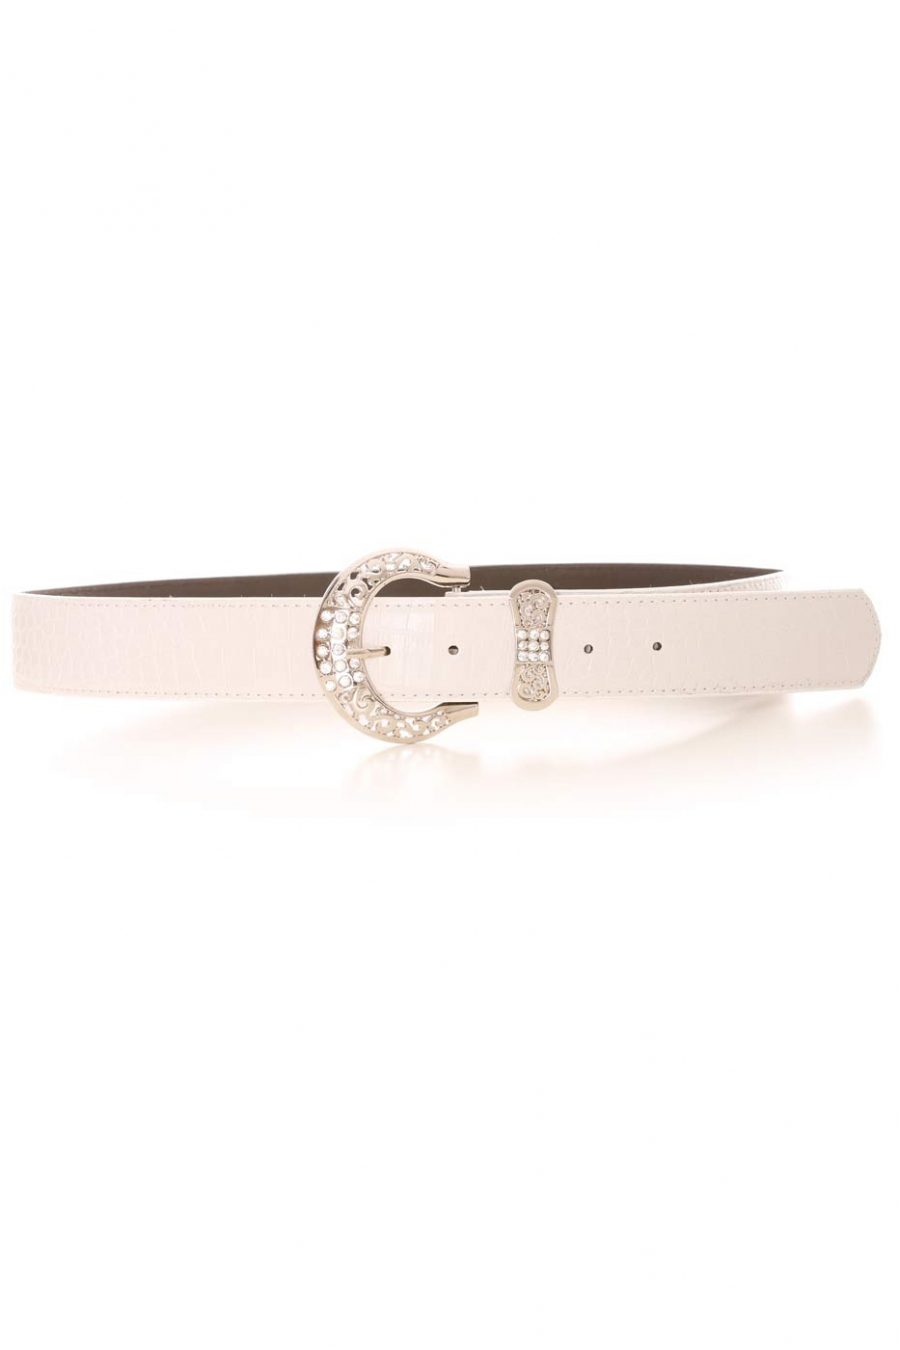 Witte riem met krokodilleneffect, zilveren gesp met strass en strikvormige lus. PVC-accessoire